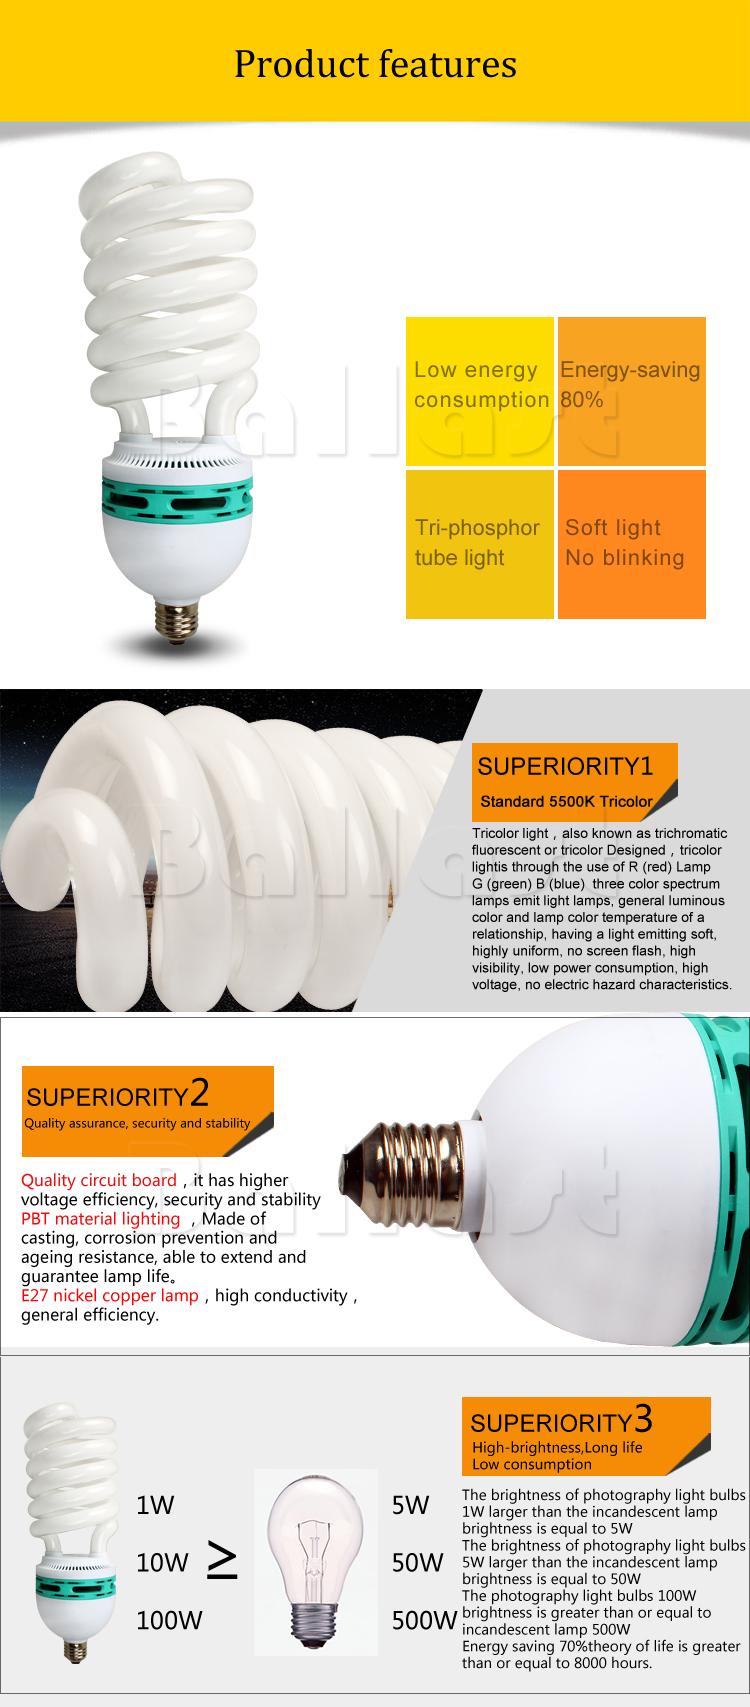 85w Half Spiral Cfl Lamp Parts Tricolor